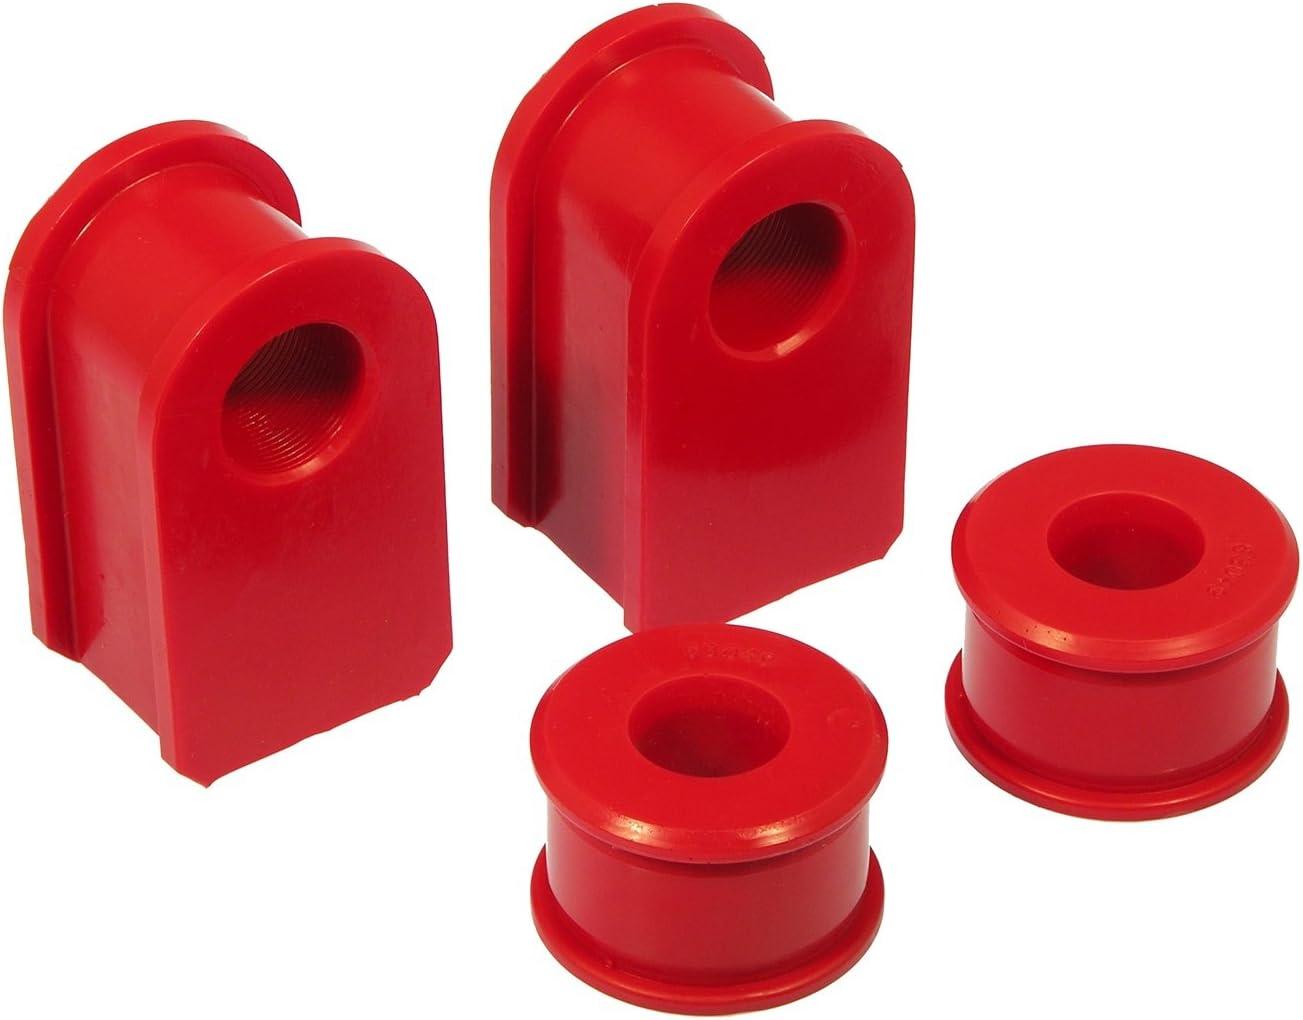 Prothane 6-1151 Red 1 Front Sway Bar Bushing Kit